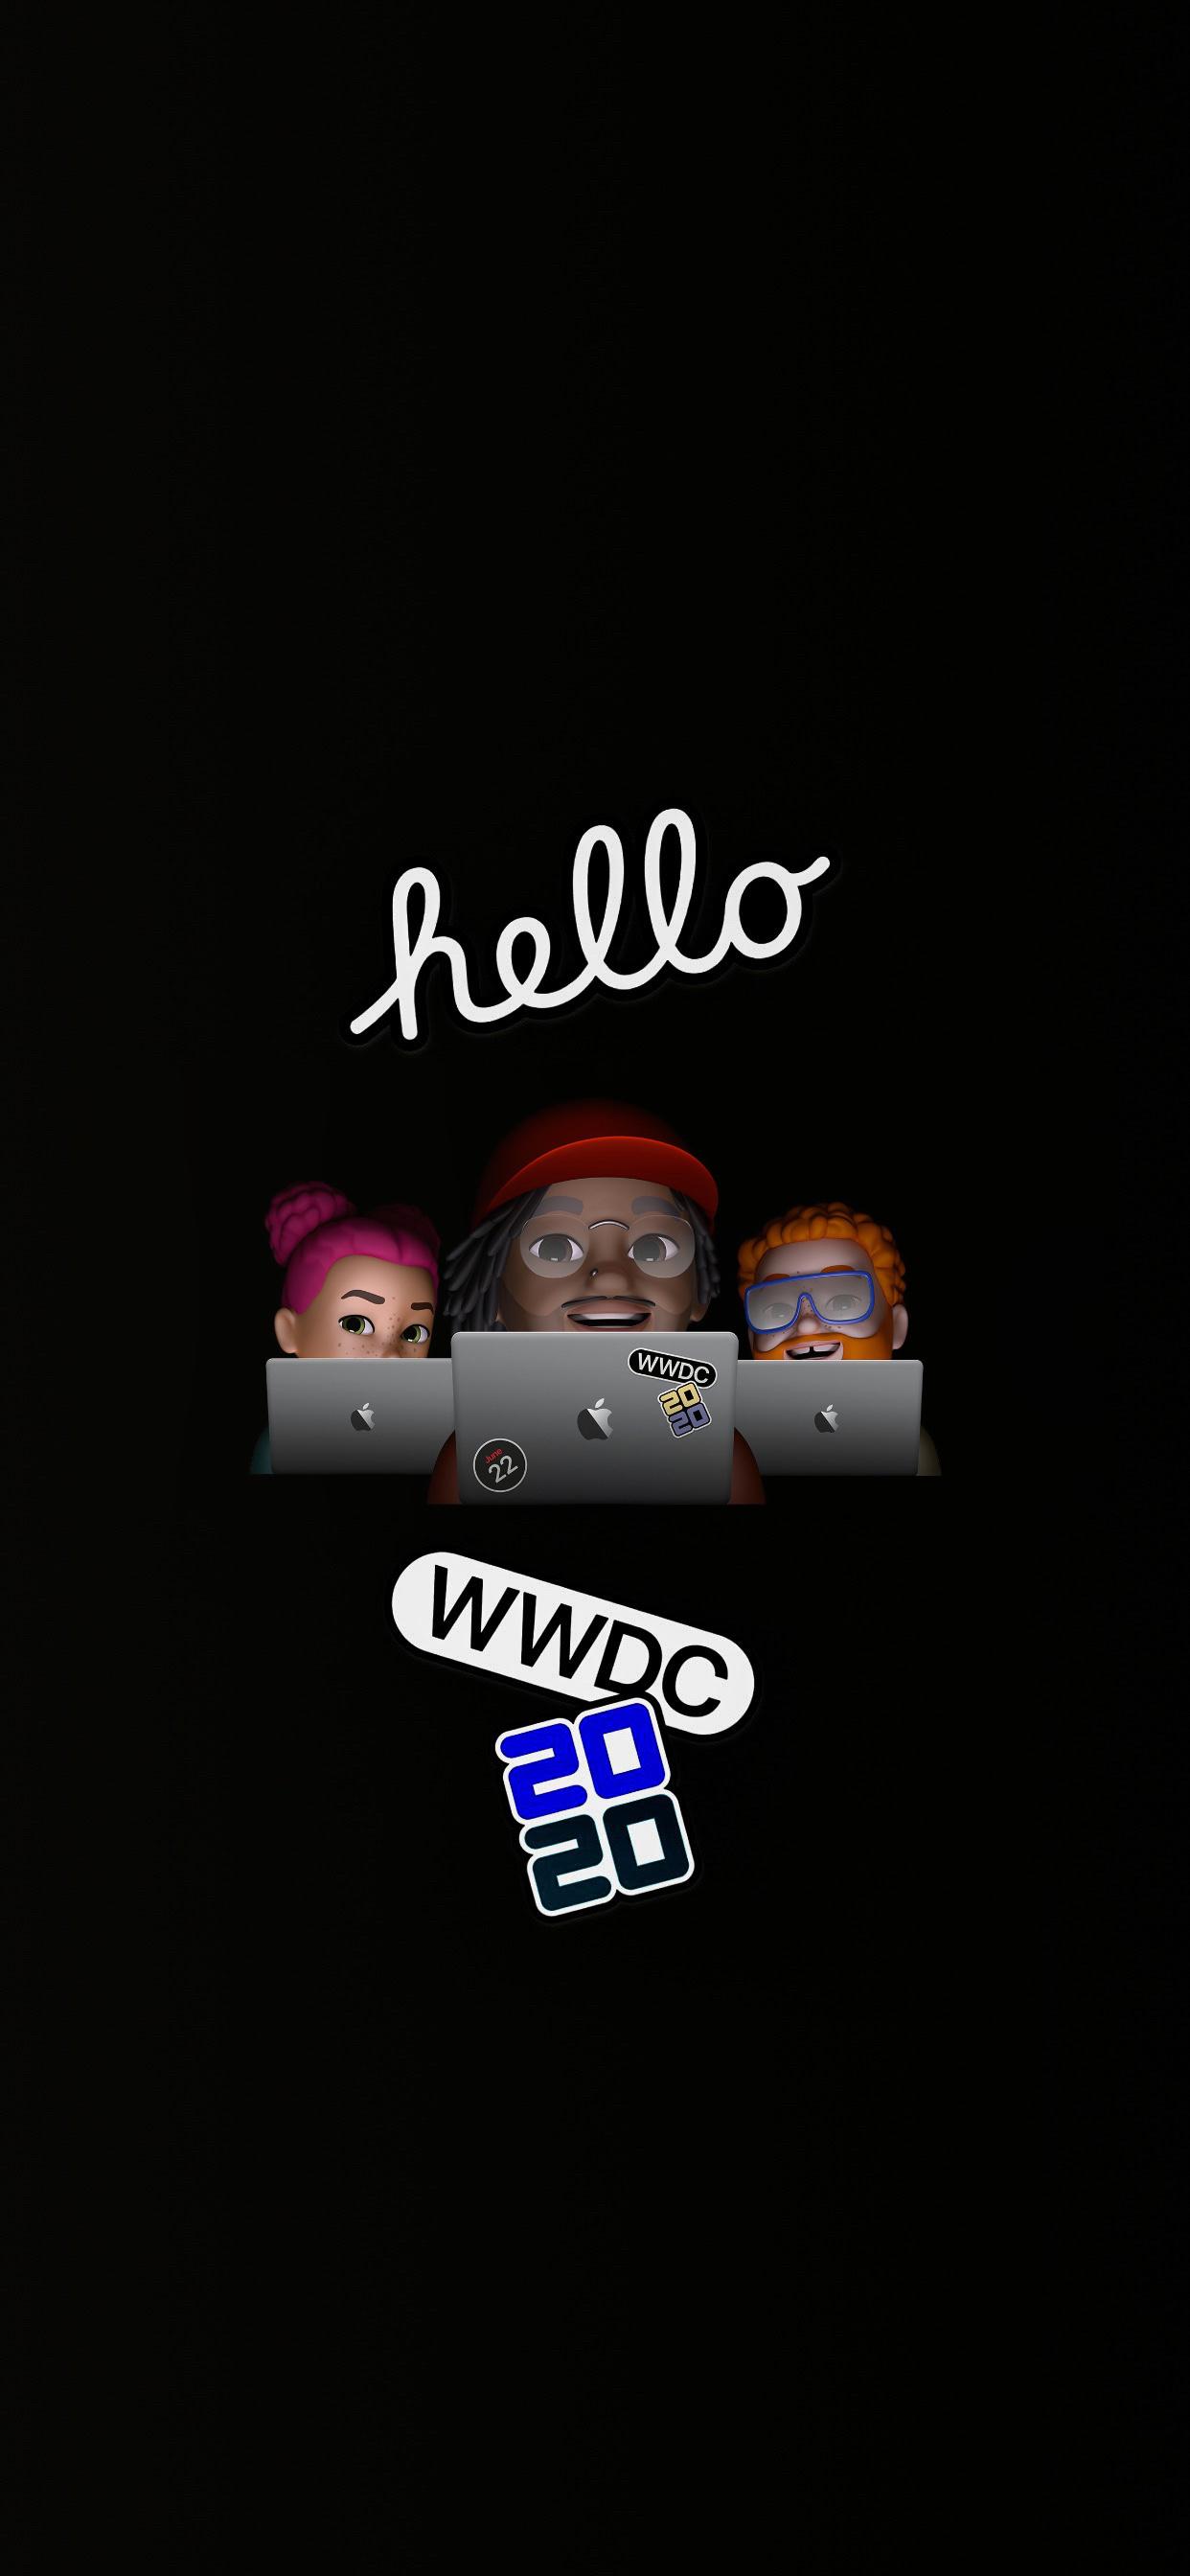 WWDC 2020 iPhone wallpaper AR72014 iDownloadBlog memoji